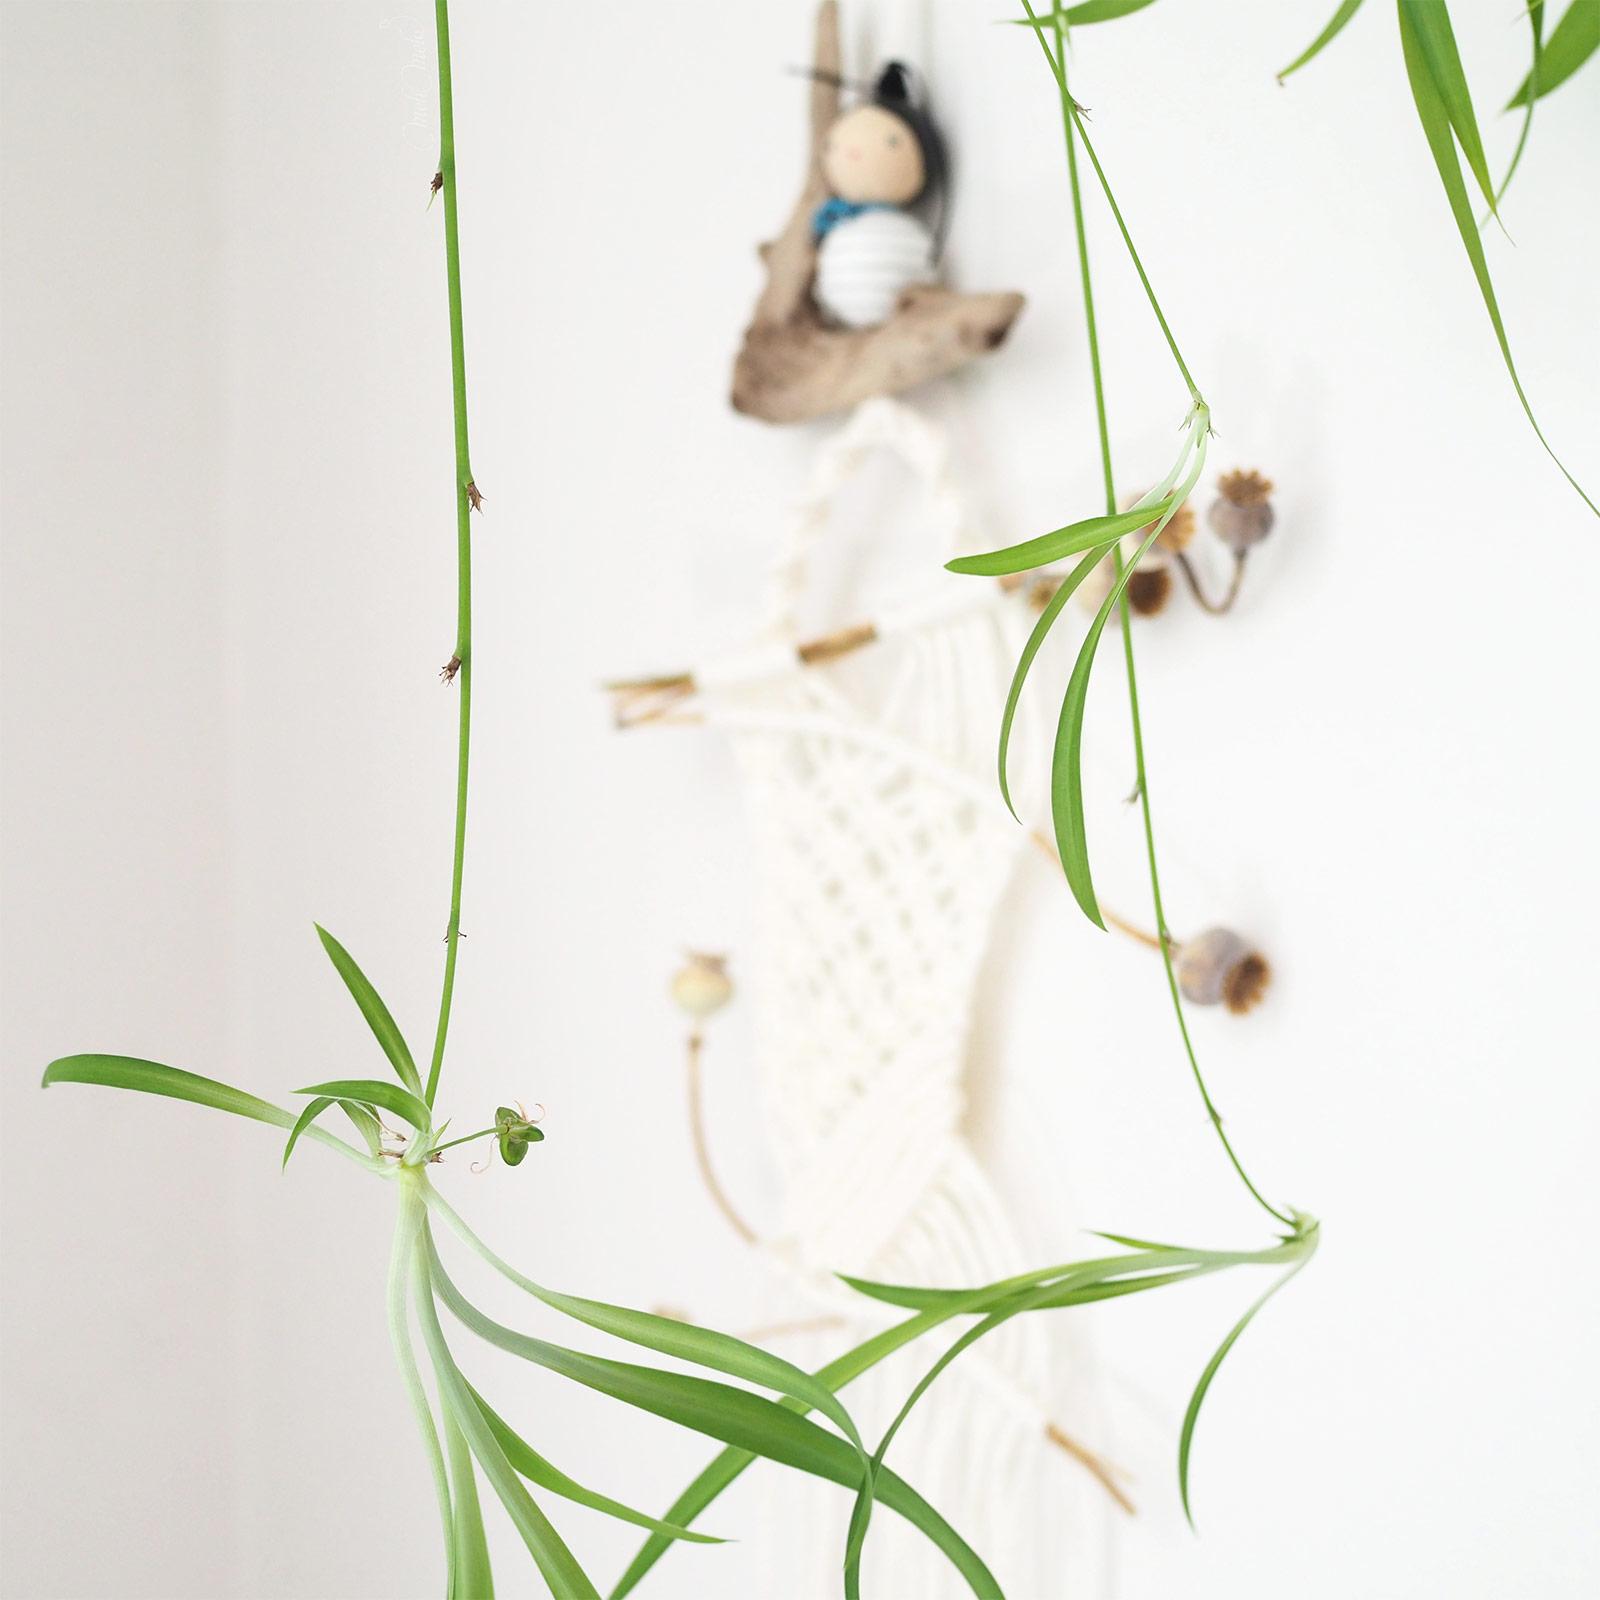 plante chlorophytum chevelu rejets plantule graines